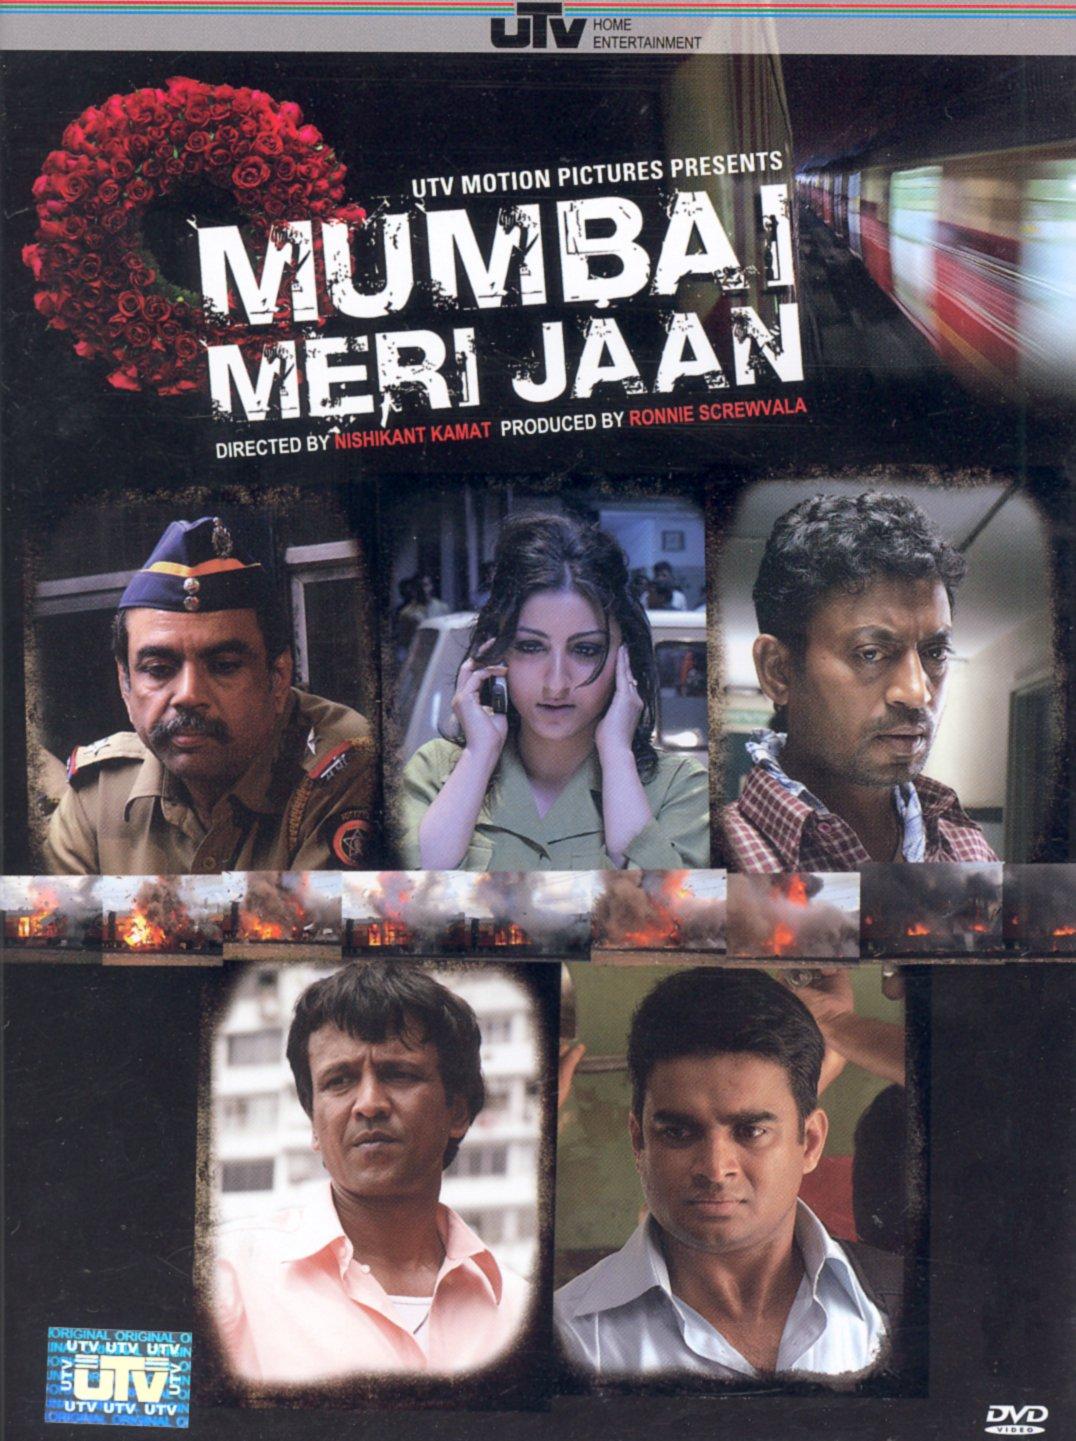 Mumbai Meri Jaan (DVD) (2008) (Hindi Film DvD/Indian Cinema/Bollywood/Thriller/Paresh Rawal)